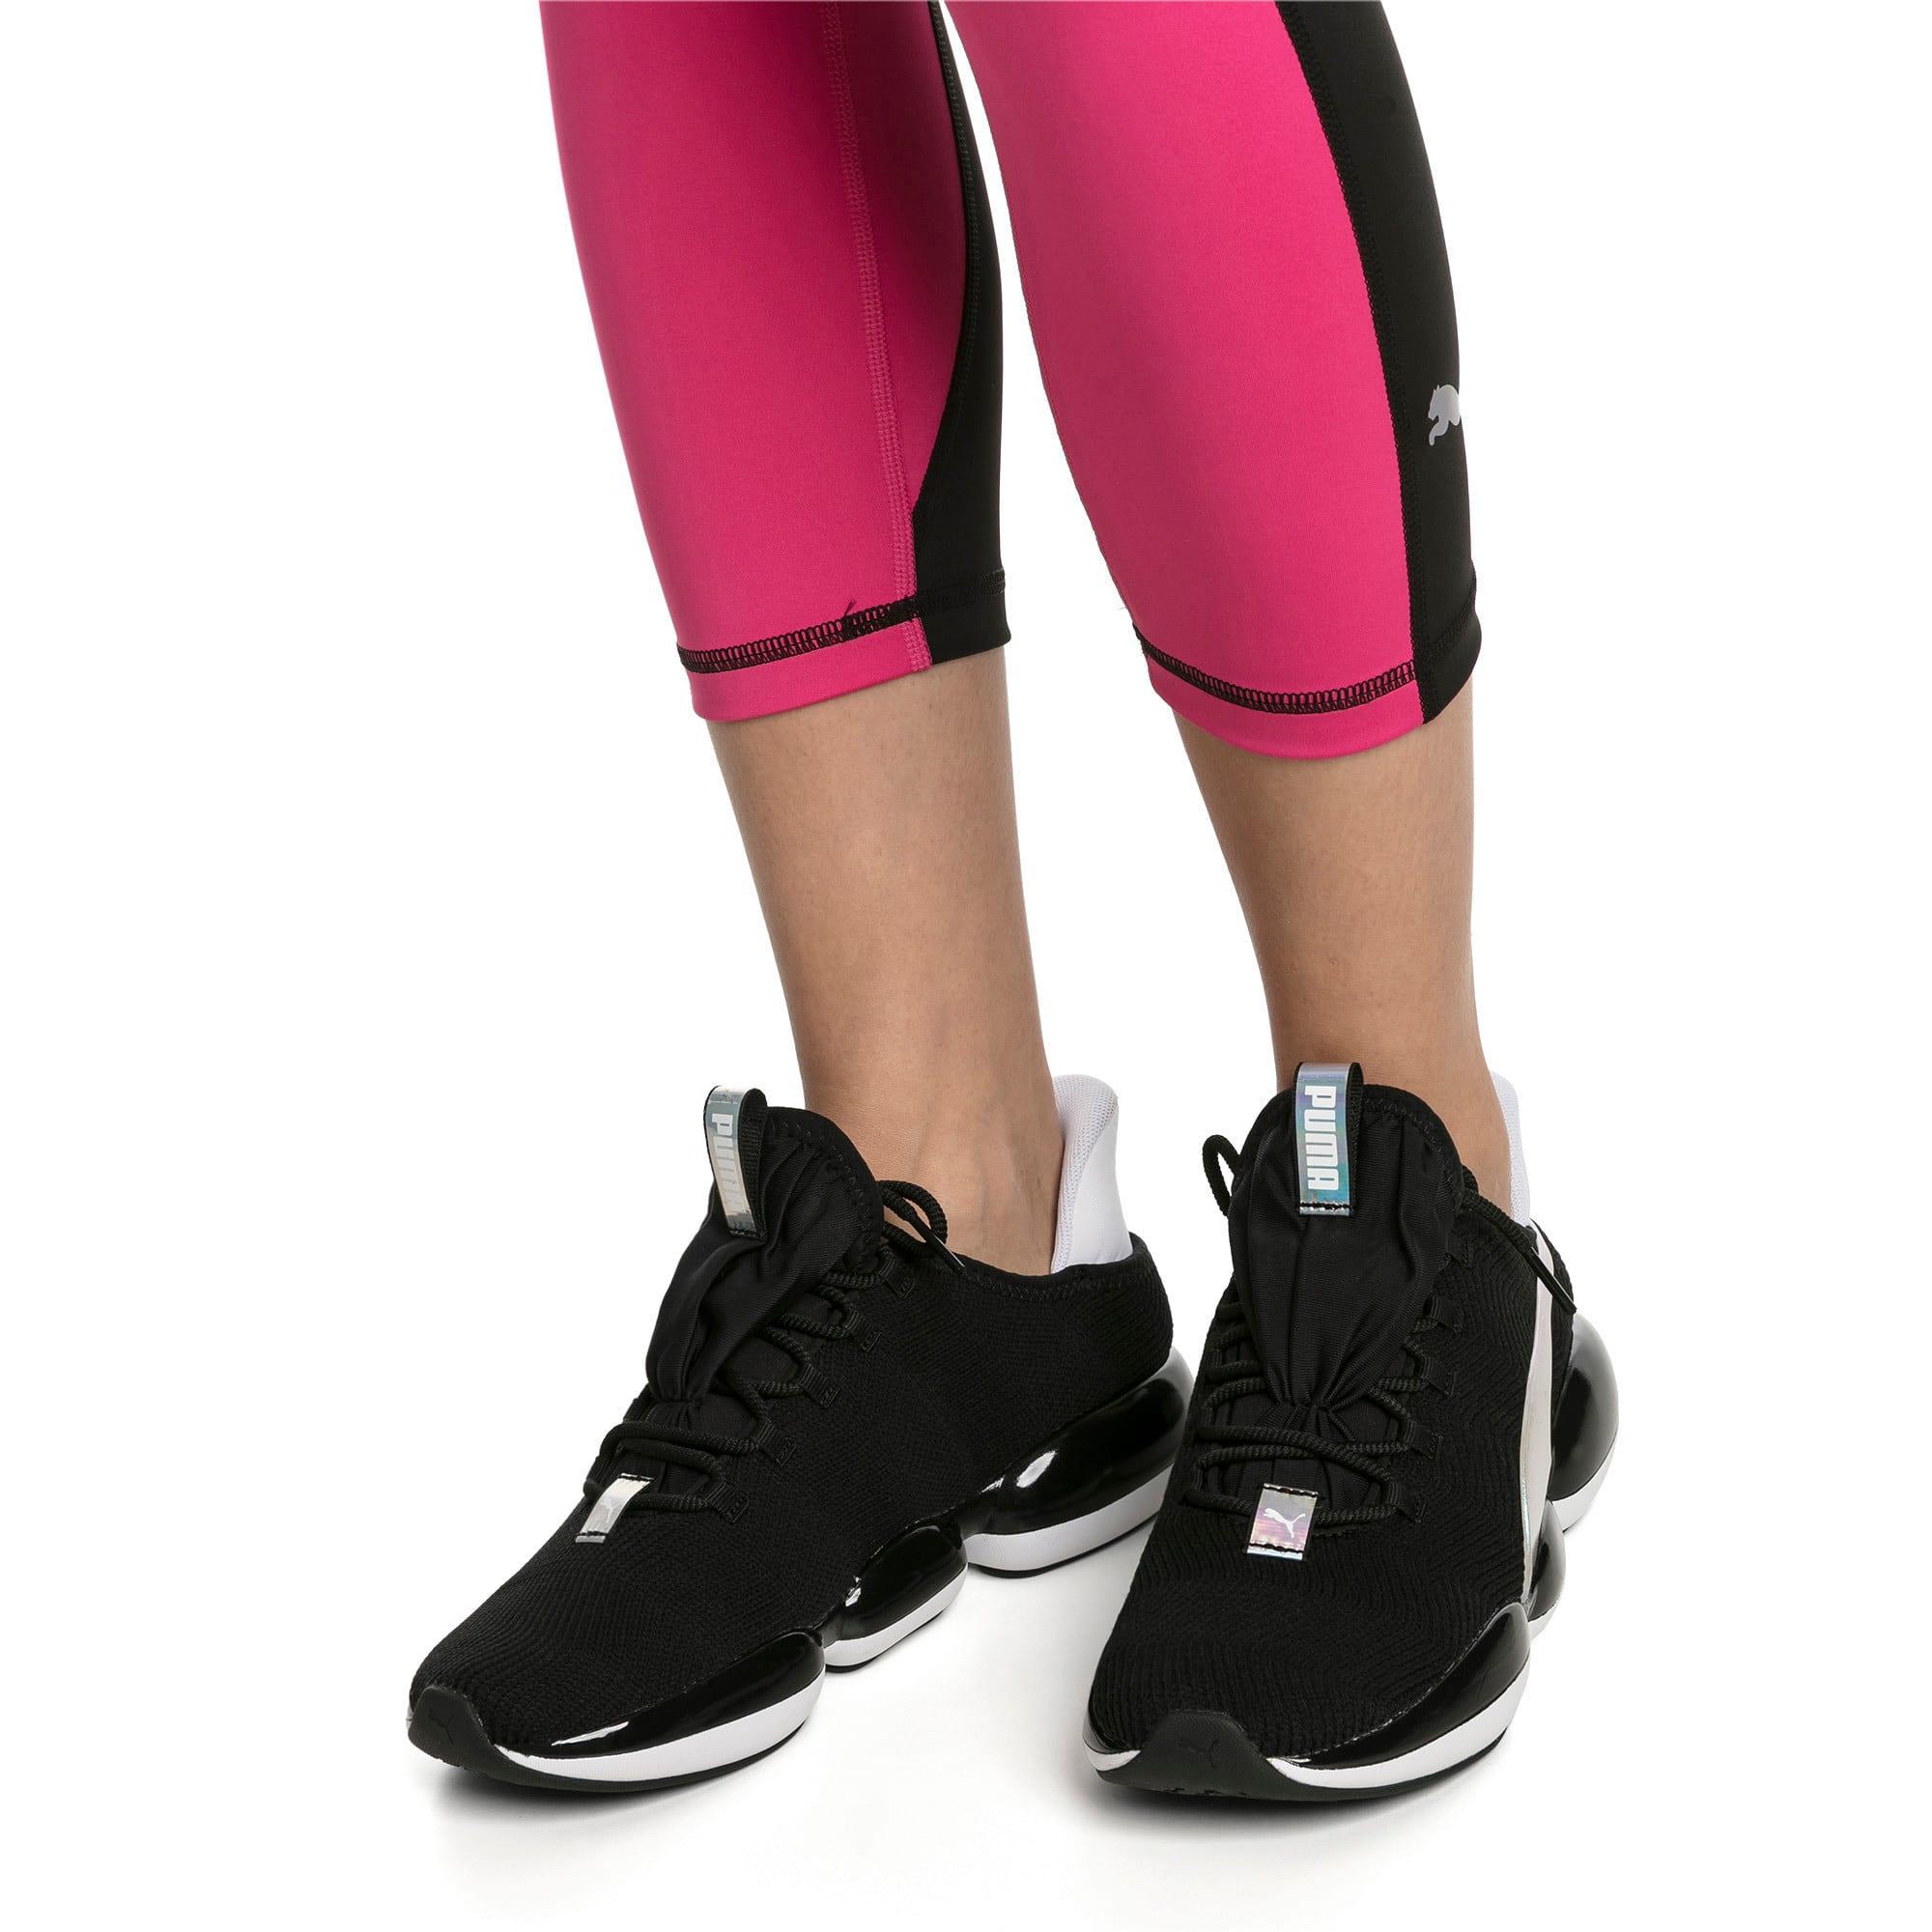 Thumbnail 2 of Mode XT Iridescent Trailblazer Women's Trainers, Puma Black-Puma White, medium